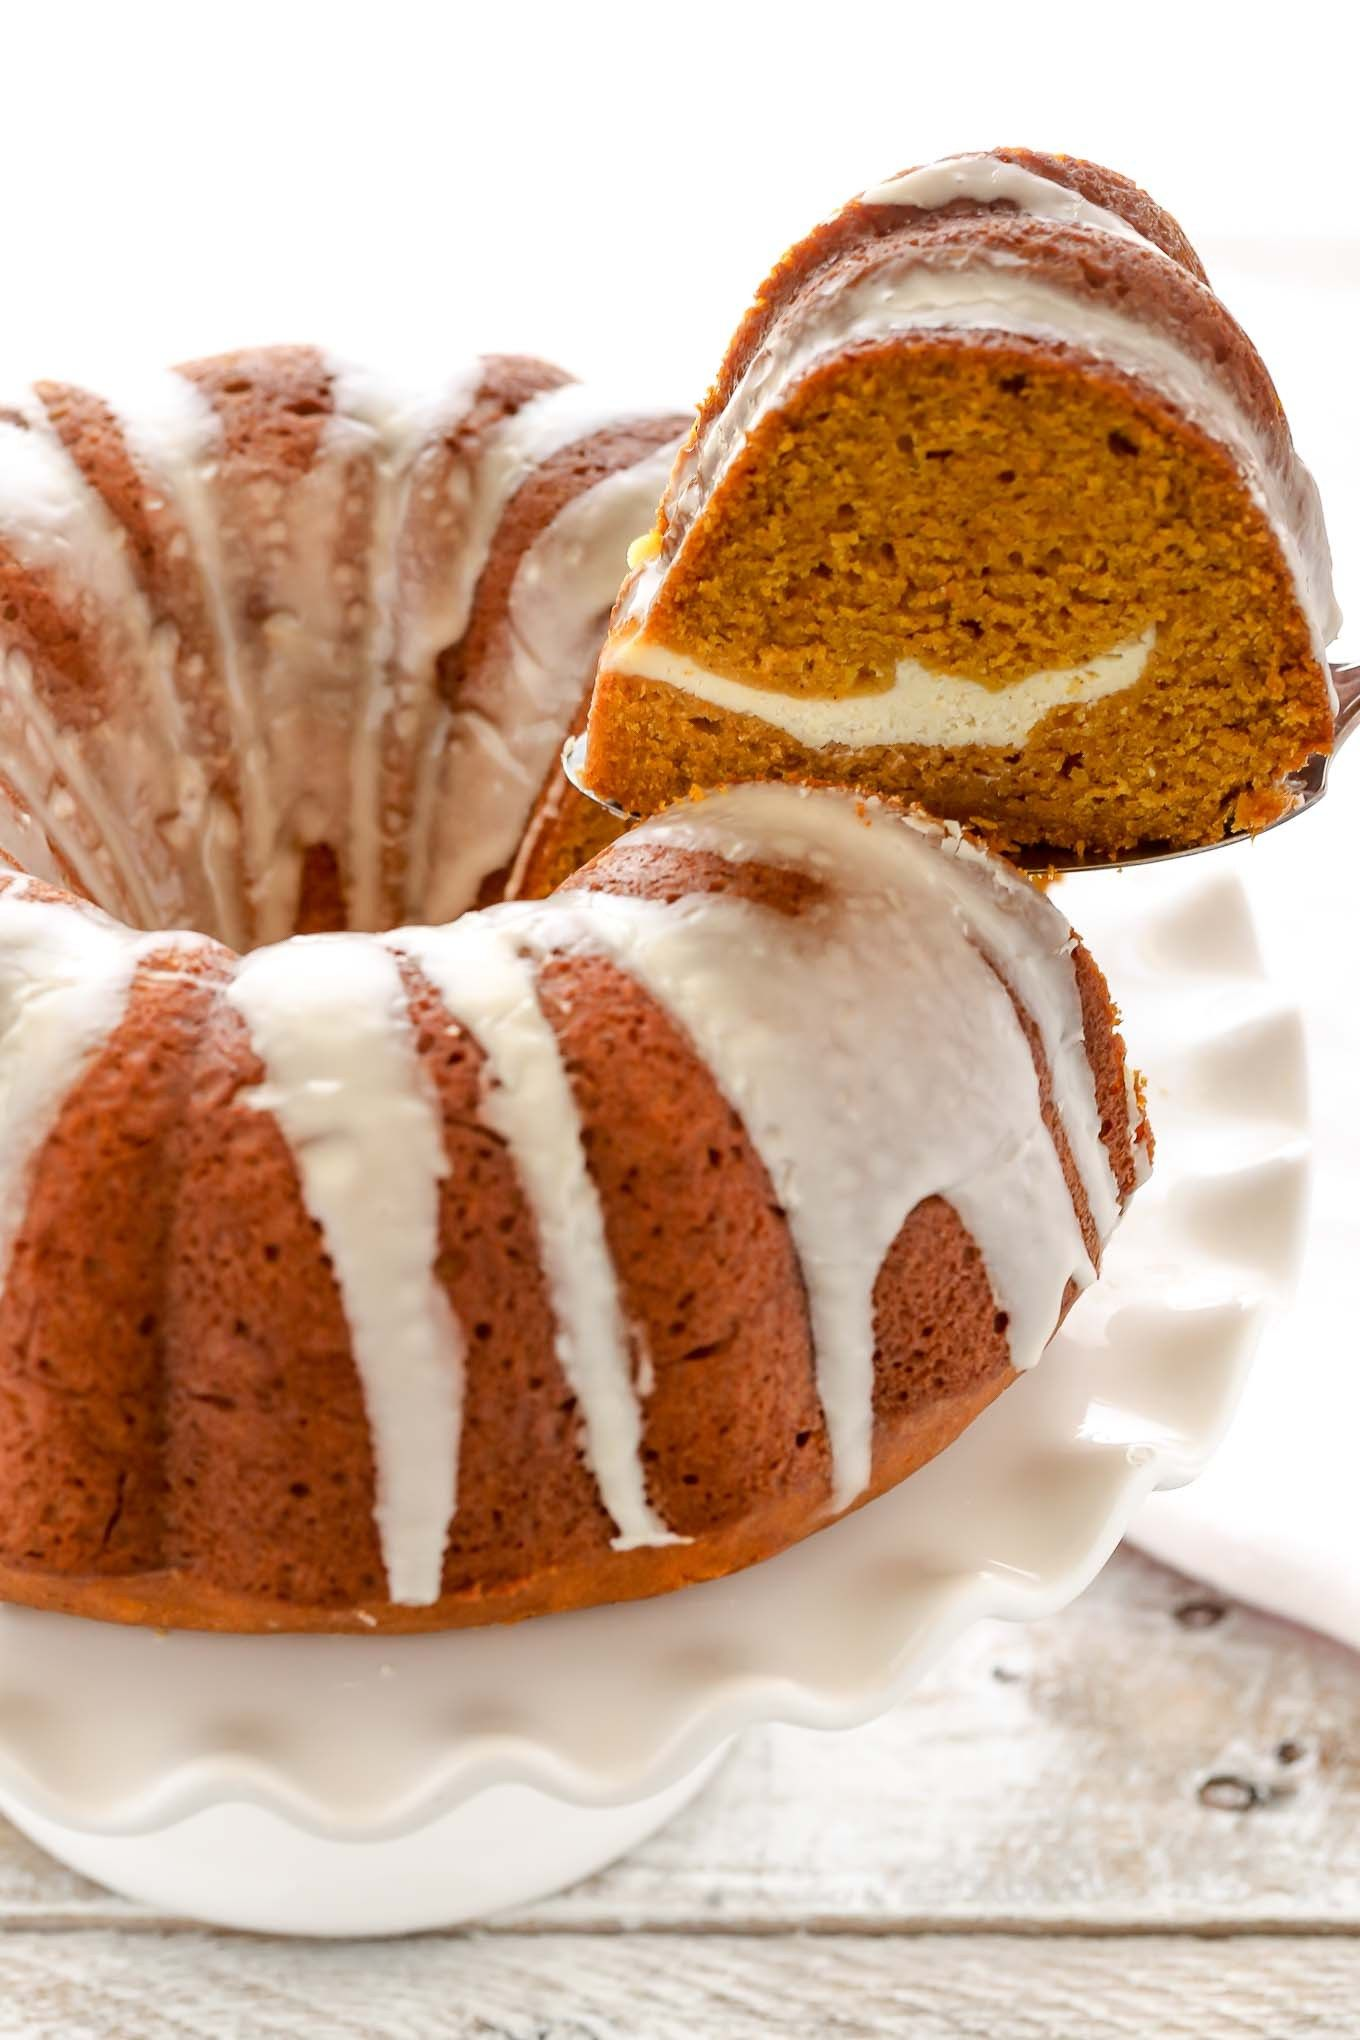 Pumpkin Cream Cheese Bundt Cake Live Well Bake Often